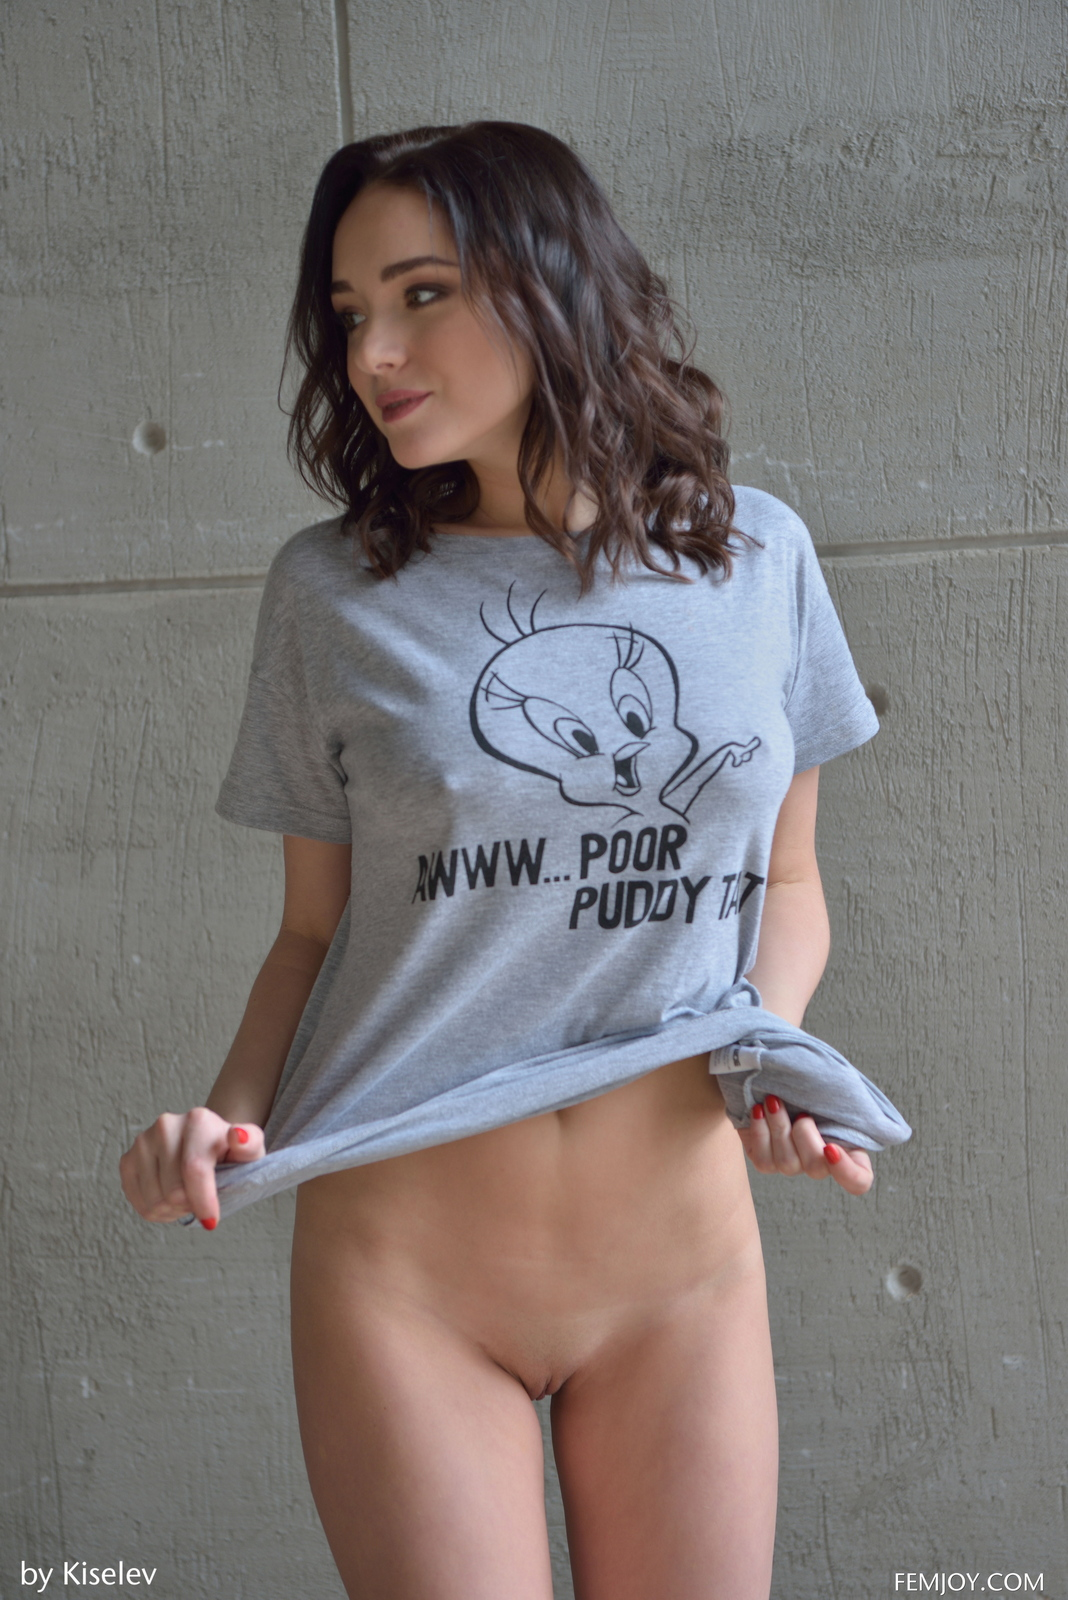 nika-a-naked-bottomless-grey-shirt-pussy-femjoy-04